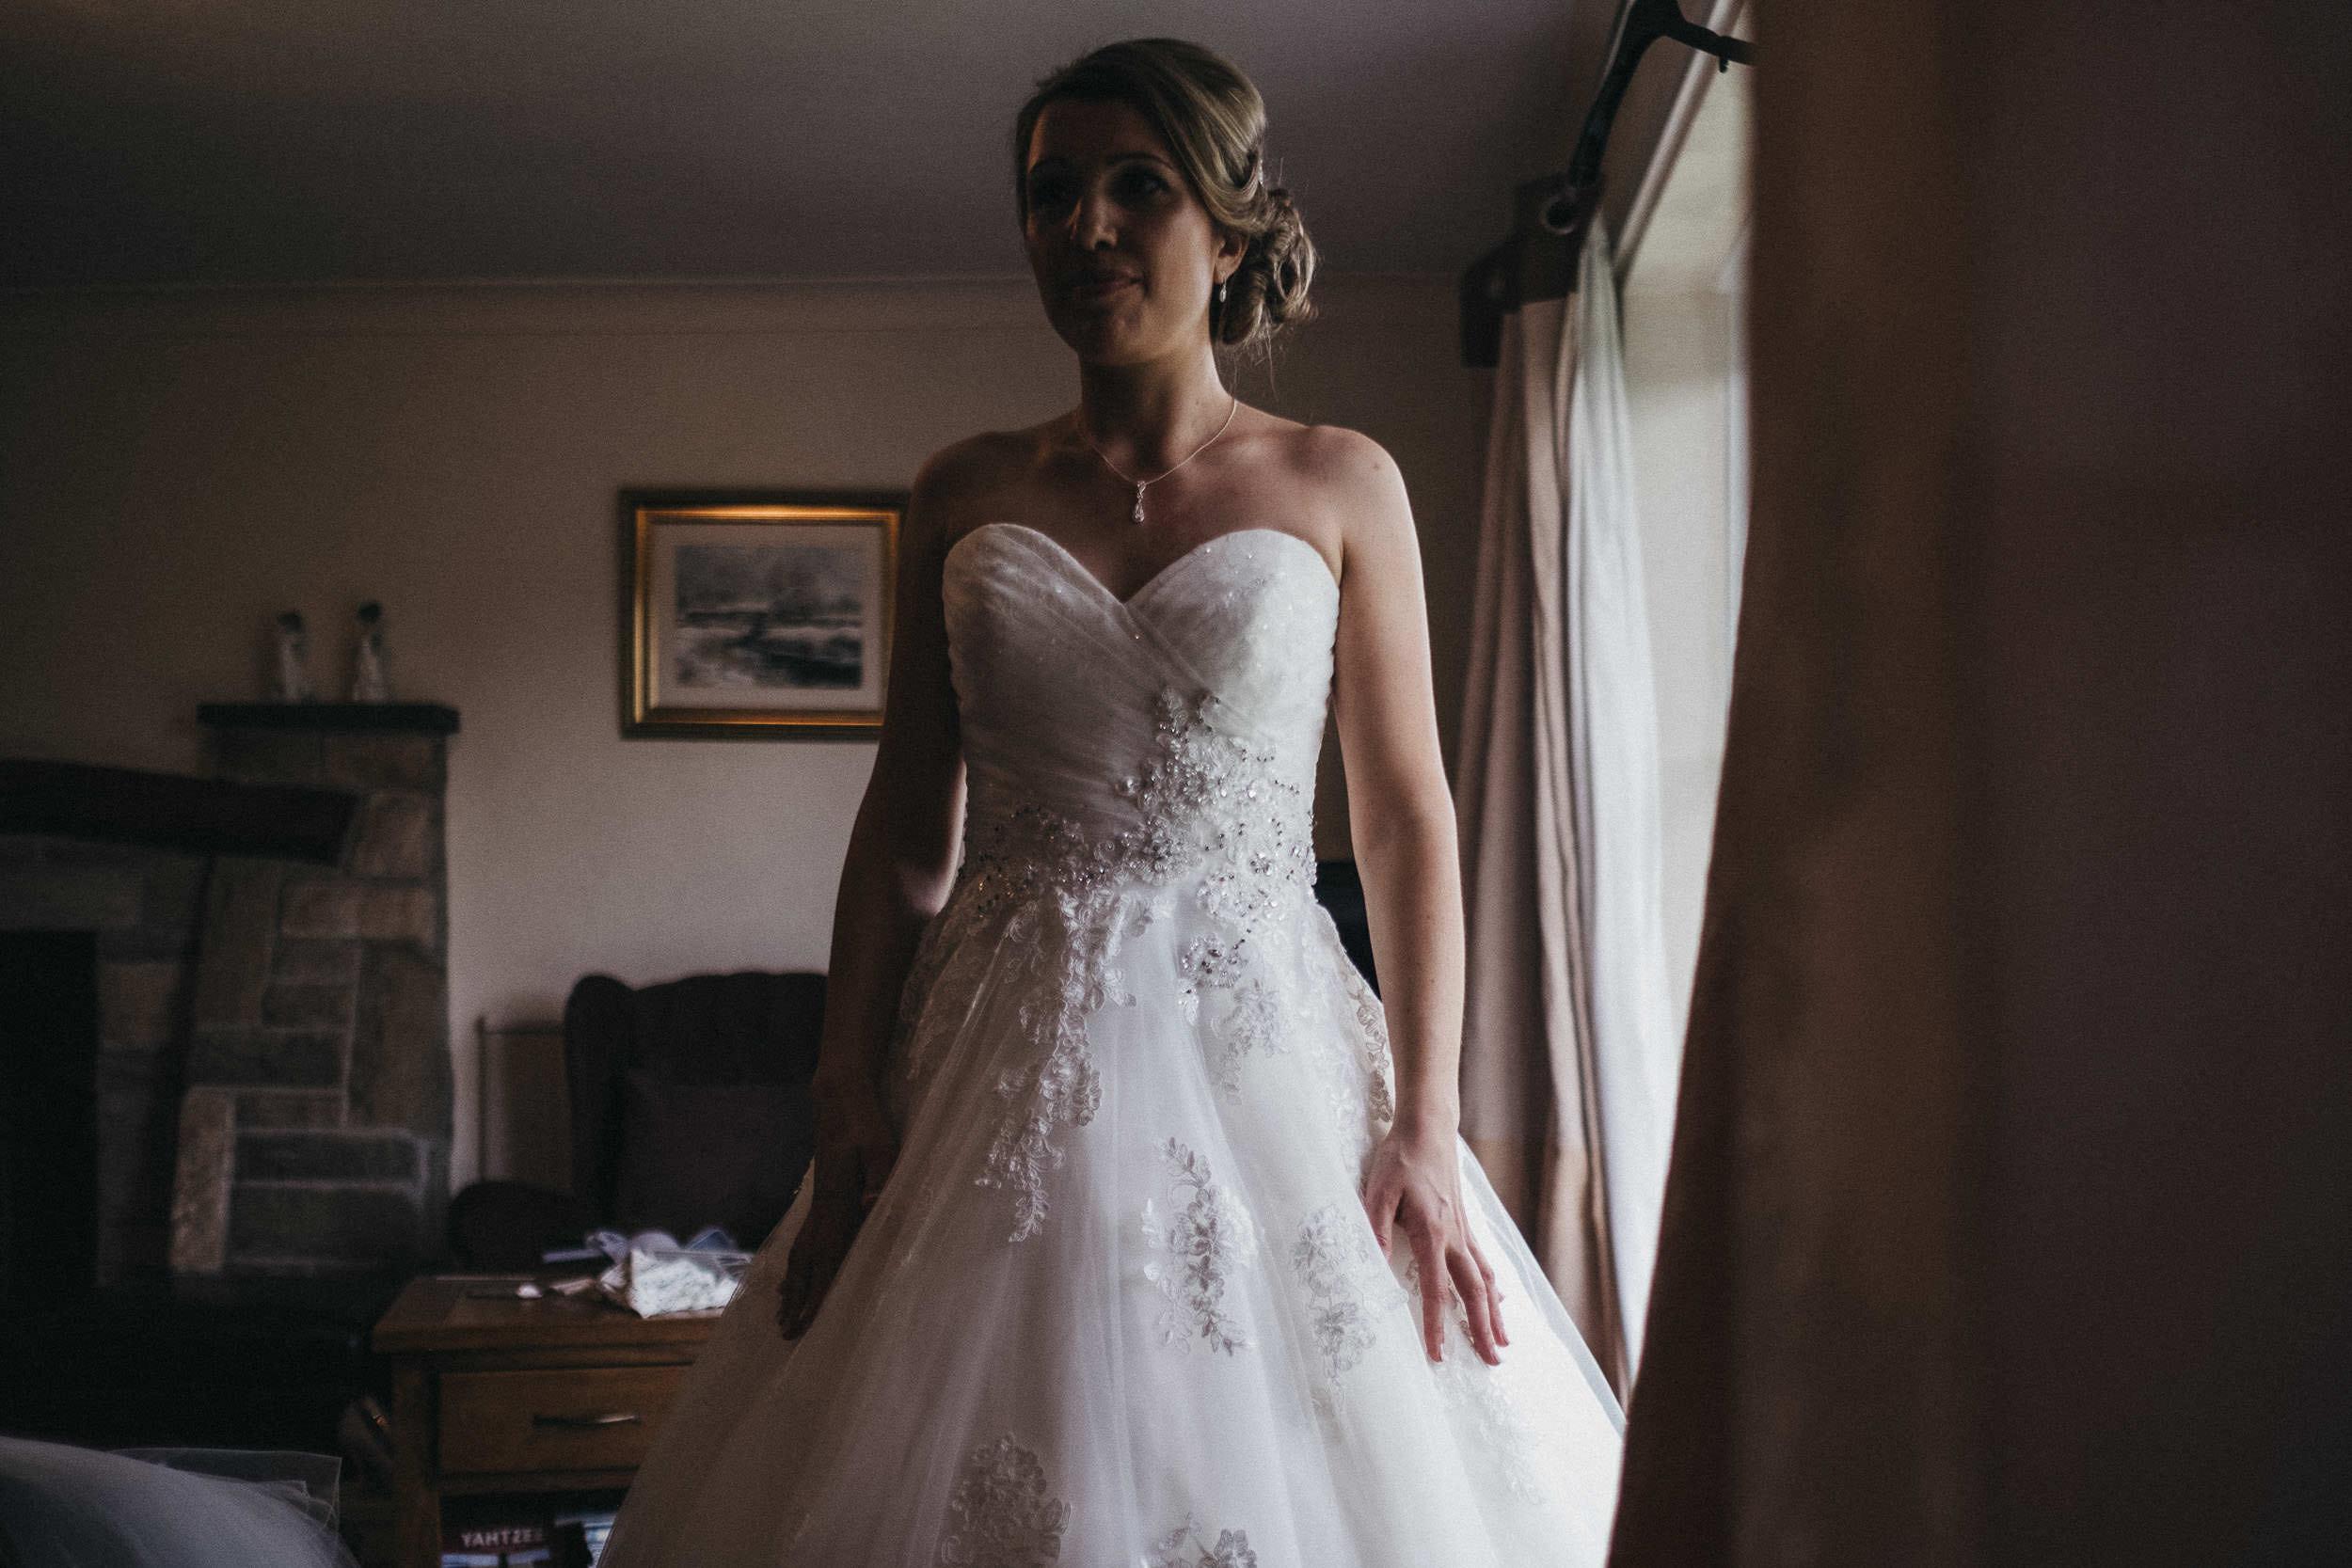 Bride standing near window showing wedding dress details